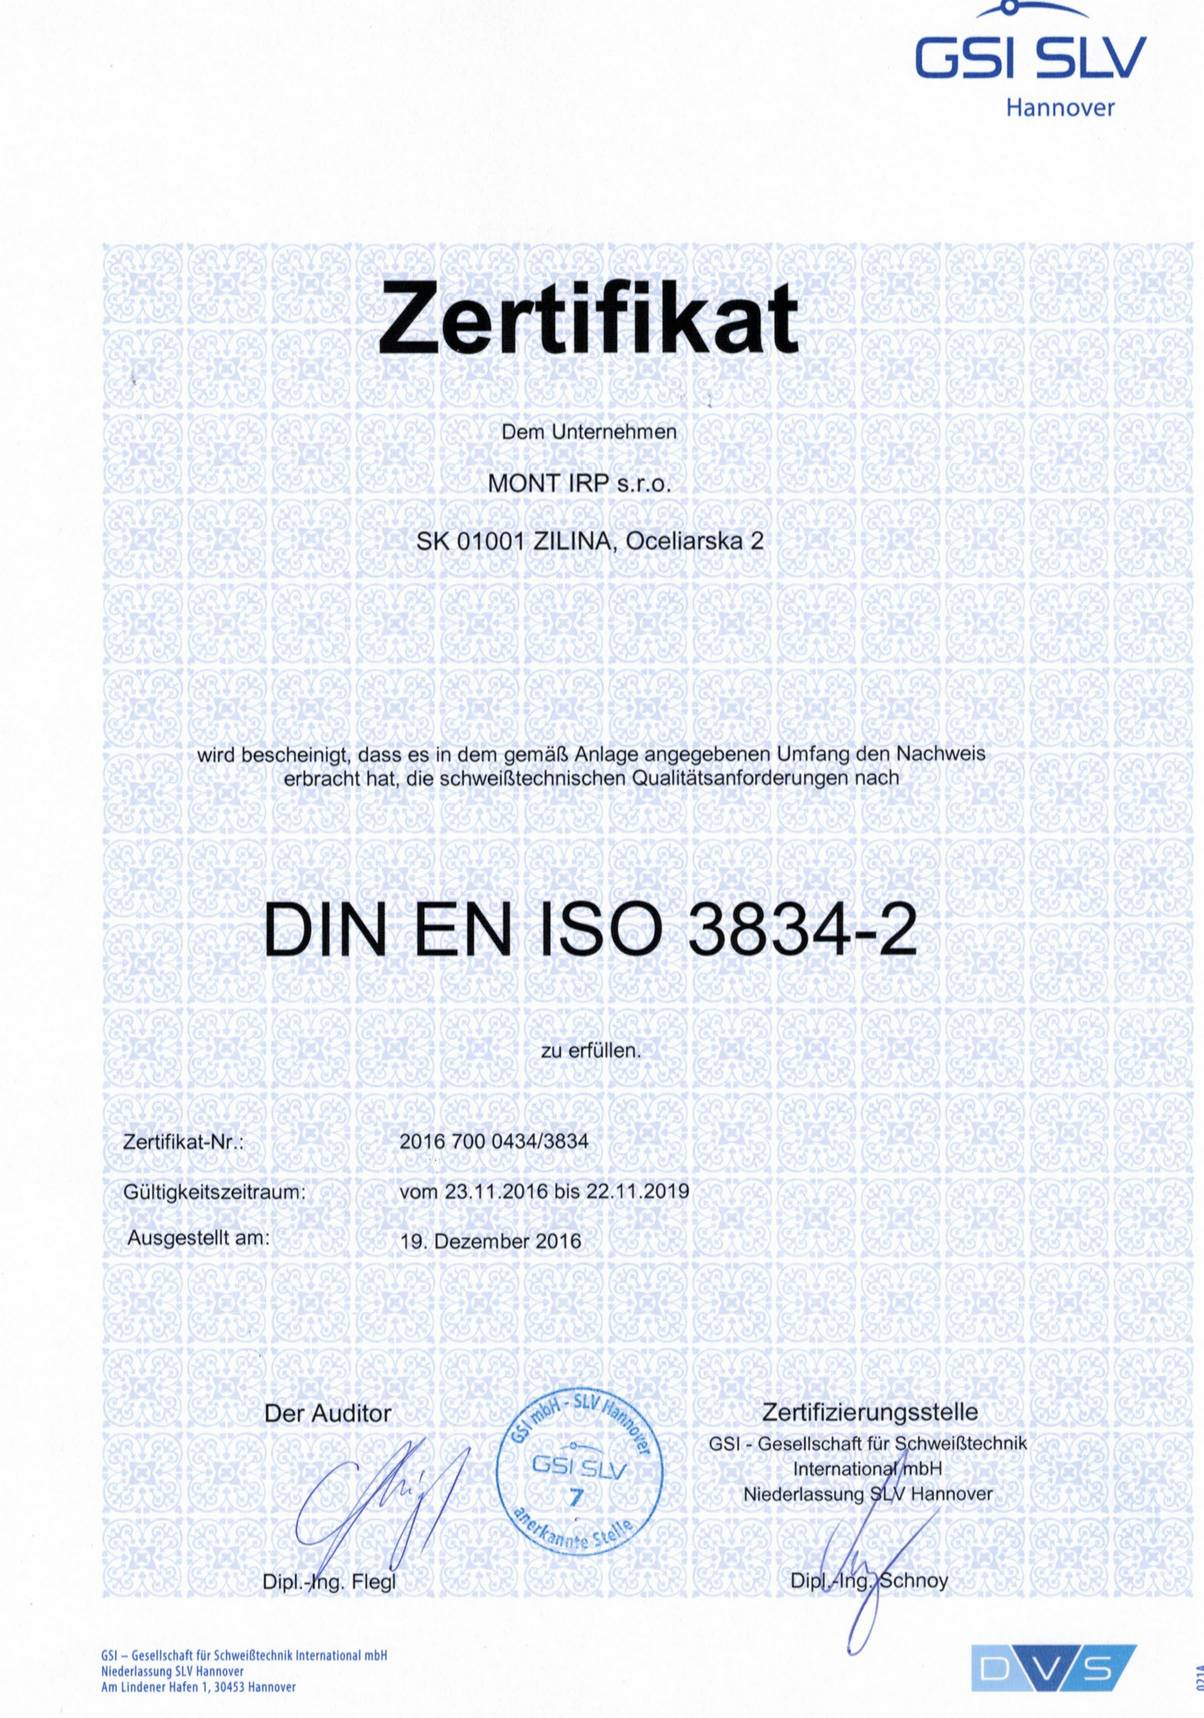 Certificate-DIN EN ISO 3834-2-cert.2016 700 0434-3834 - DE-do22.11.2019_Page_1